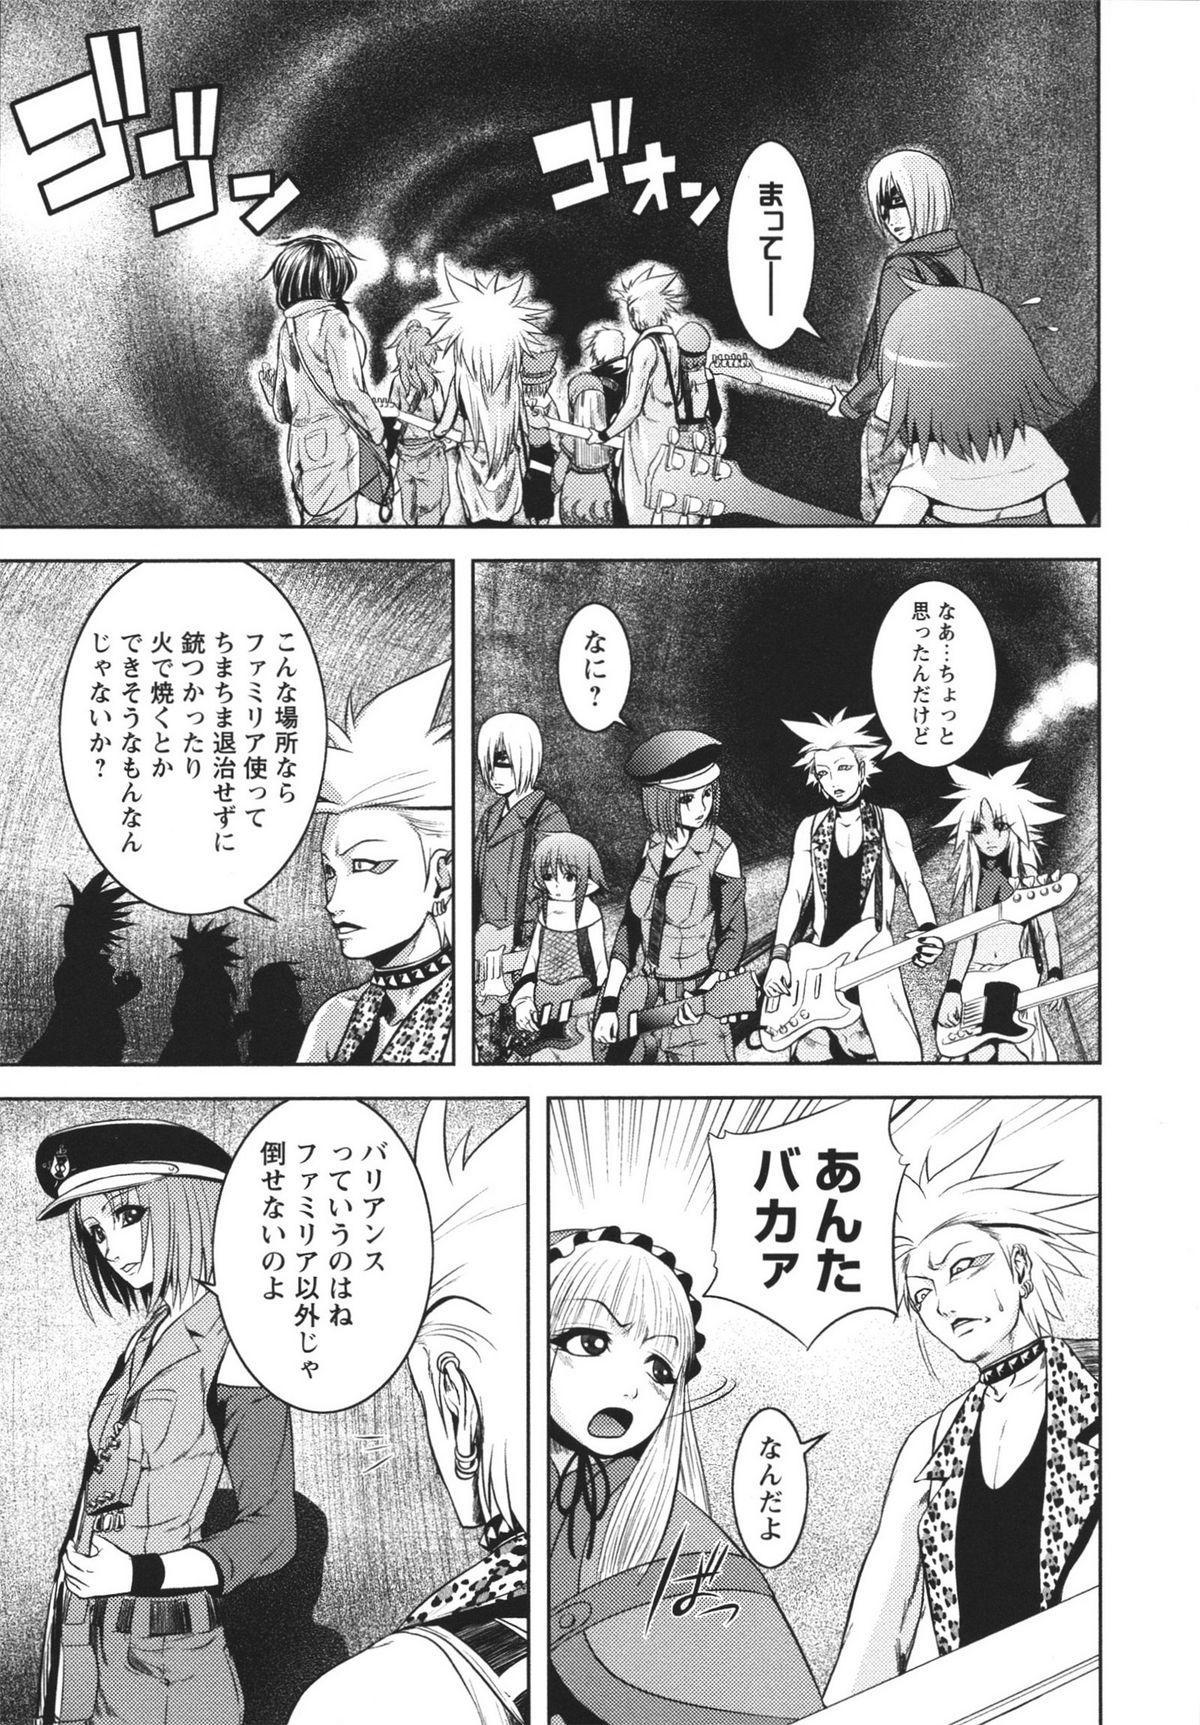 [Kawazuko Chouji] m7 -Minor Seven- Jou 126